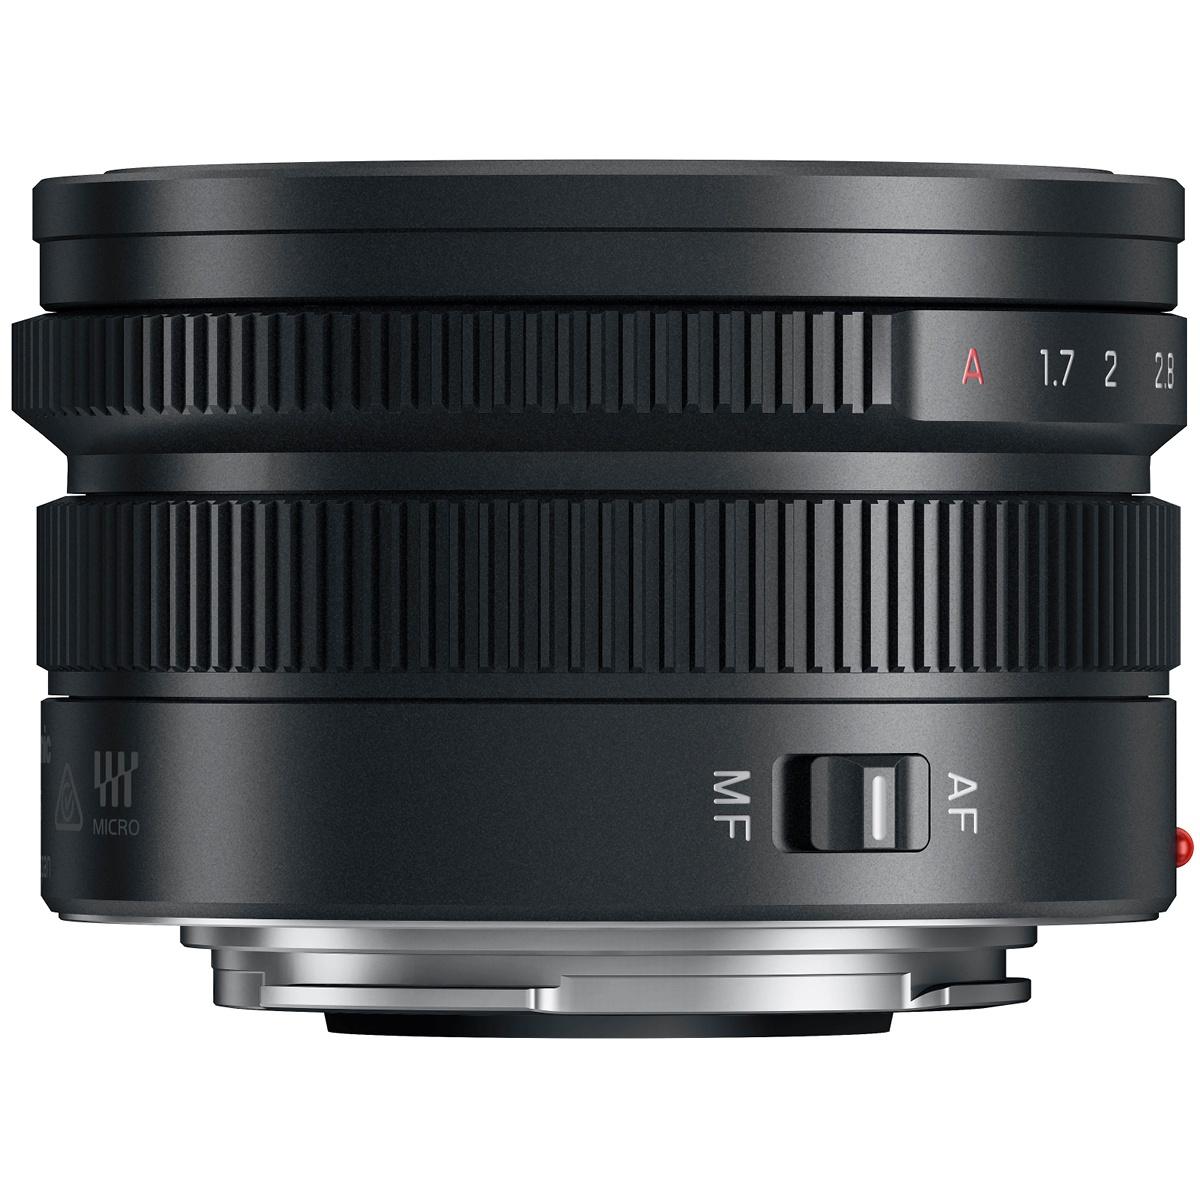 Panasonic 15 mm 1:1,7 Leica Summilux ASPH